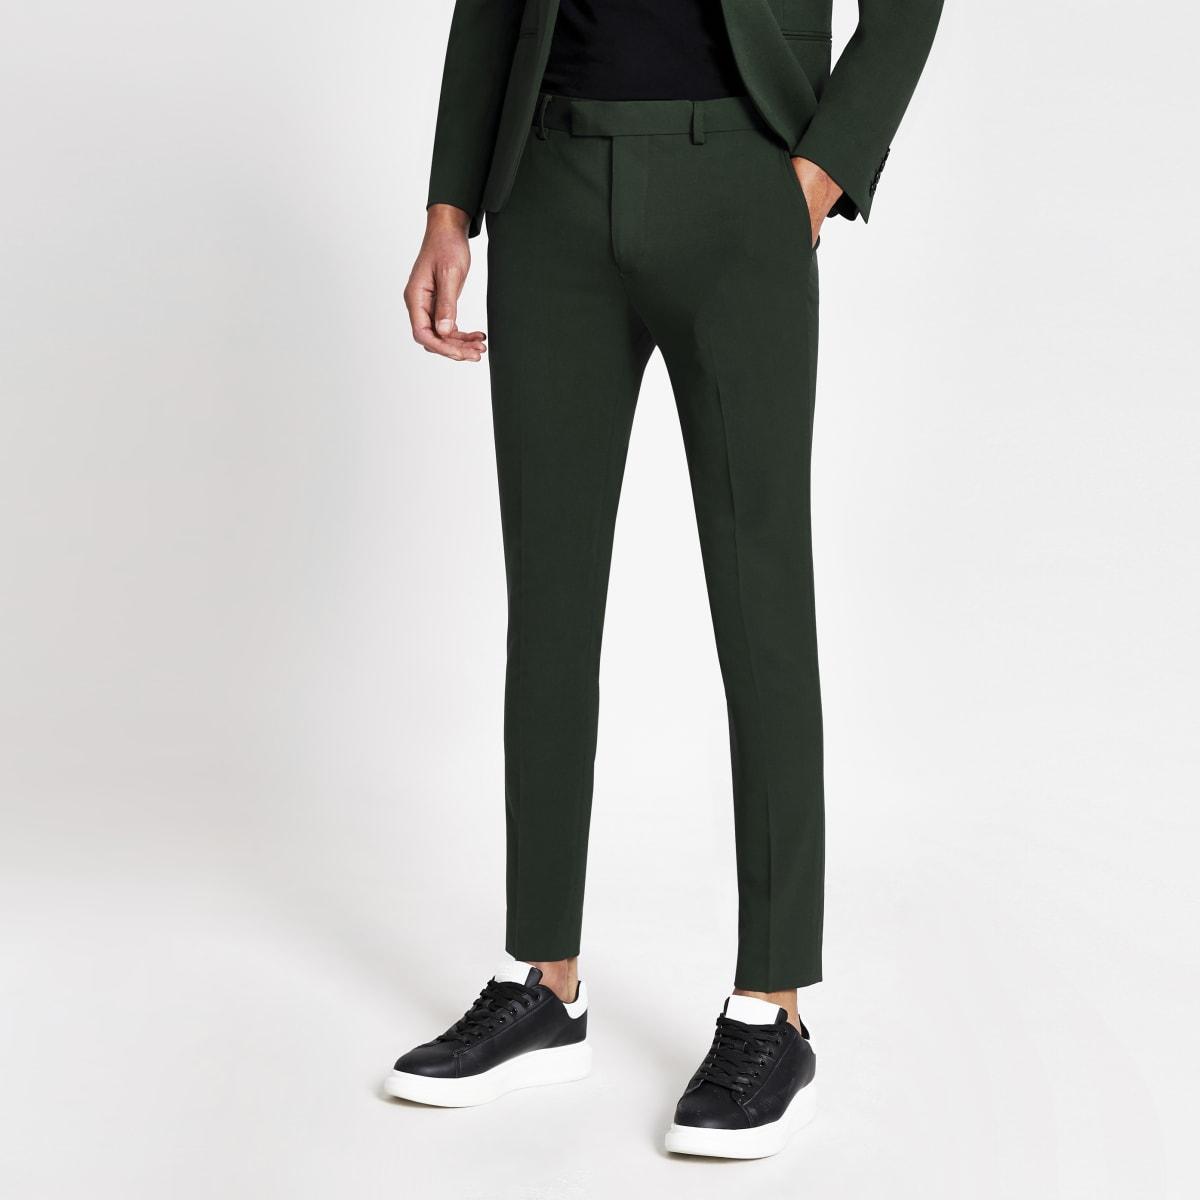 Donkergroene superskinny pantalon